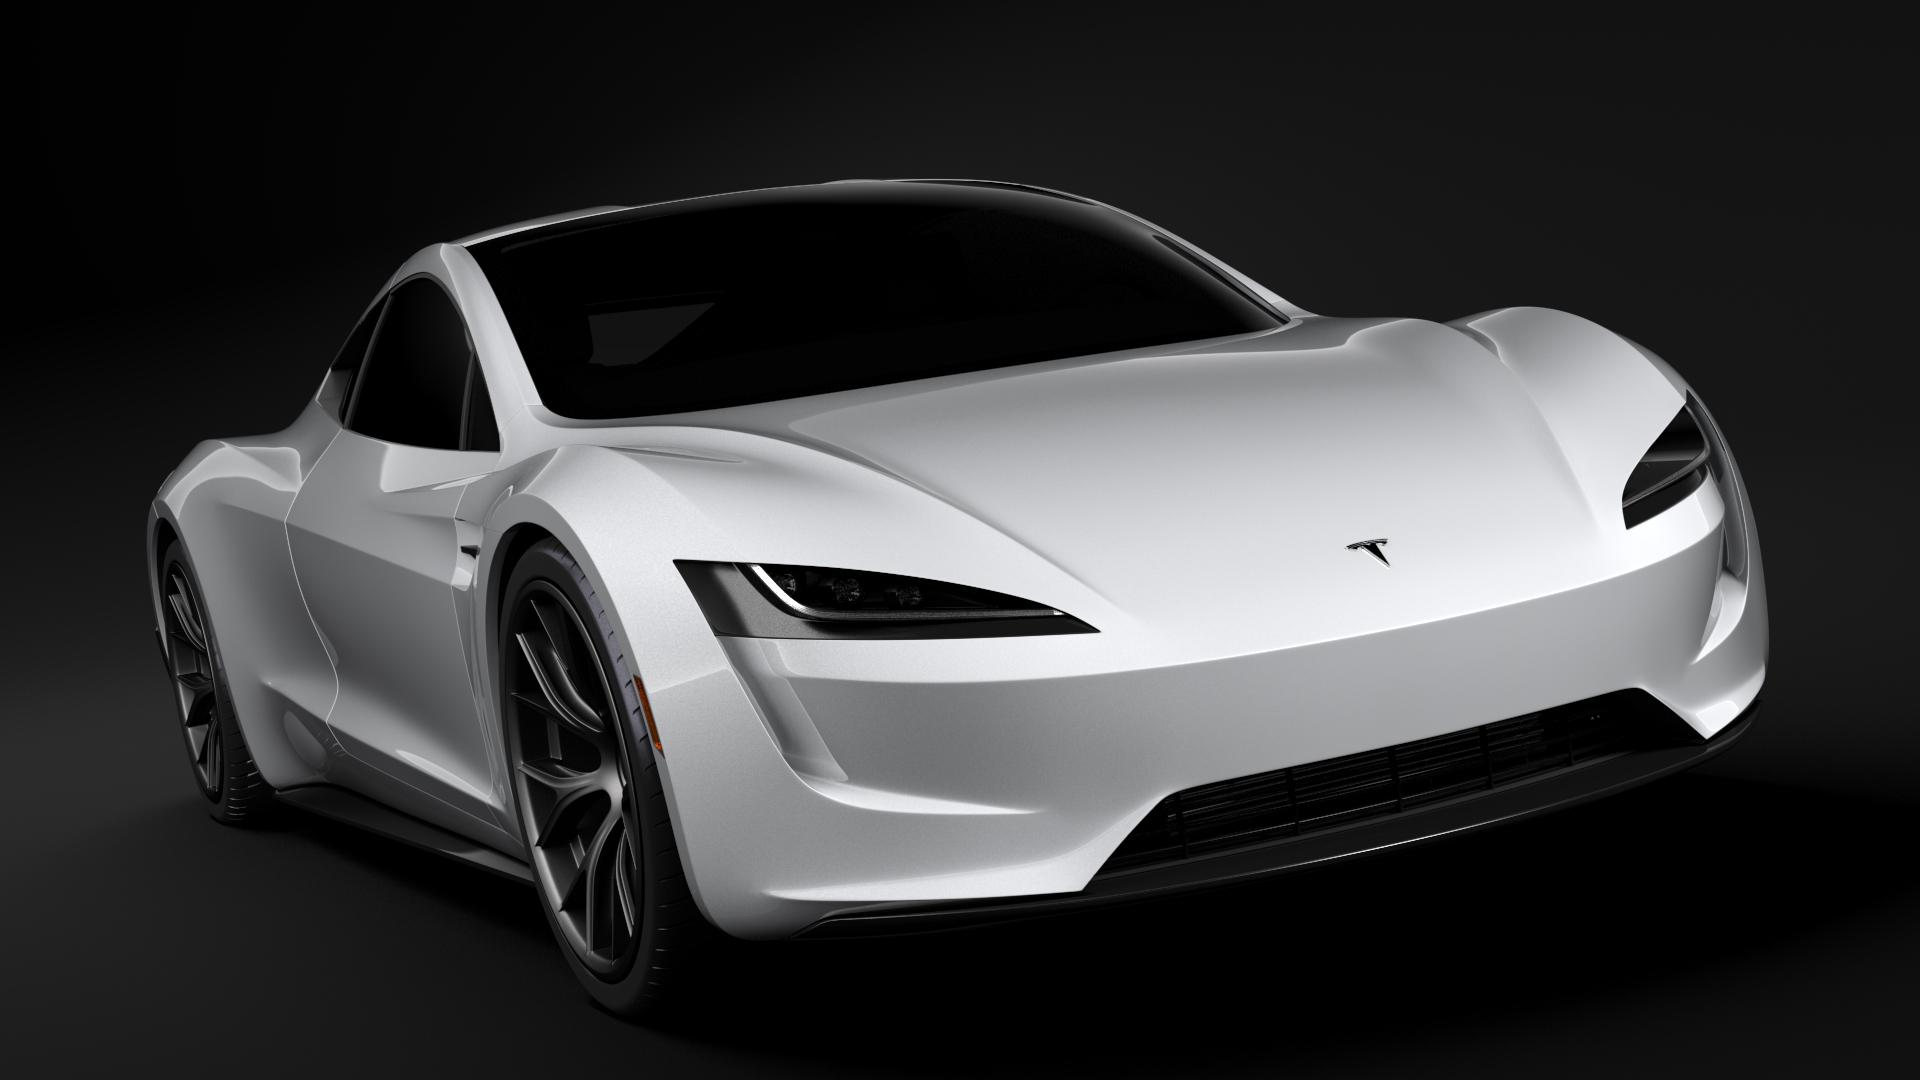 tesla coupe 2020 3d model max fbx c4d lwo ma mb hrc xsi obj 277978